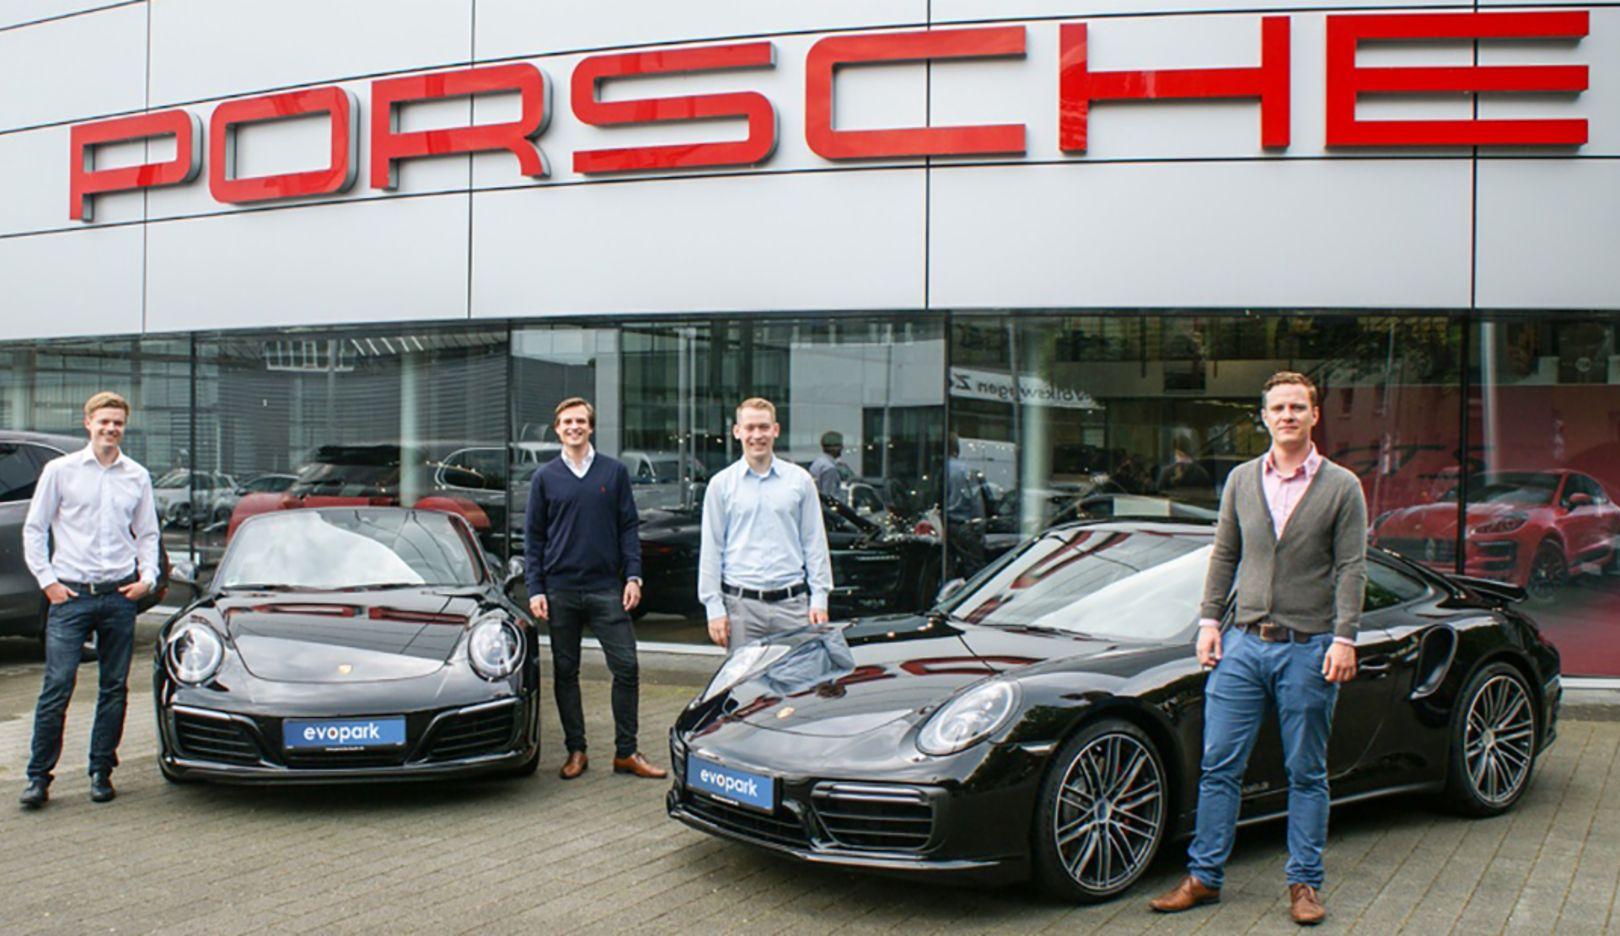 Maximilian Messing, Marik Hermann, Tobias Weiper, Sven Lackinger, l-r, Gründer Evopark, 2016, Porsche AG